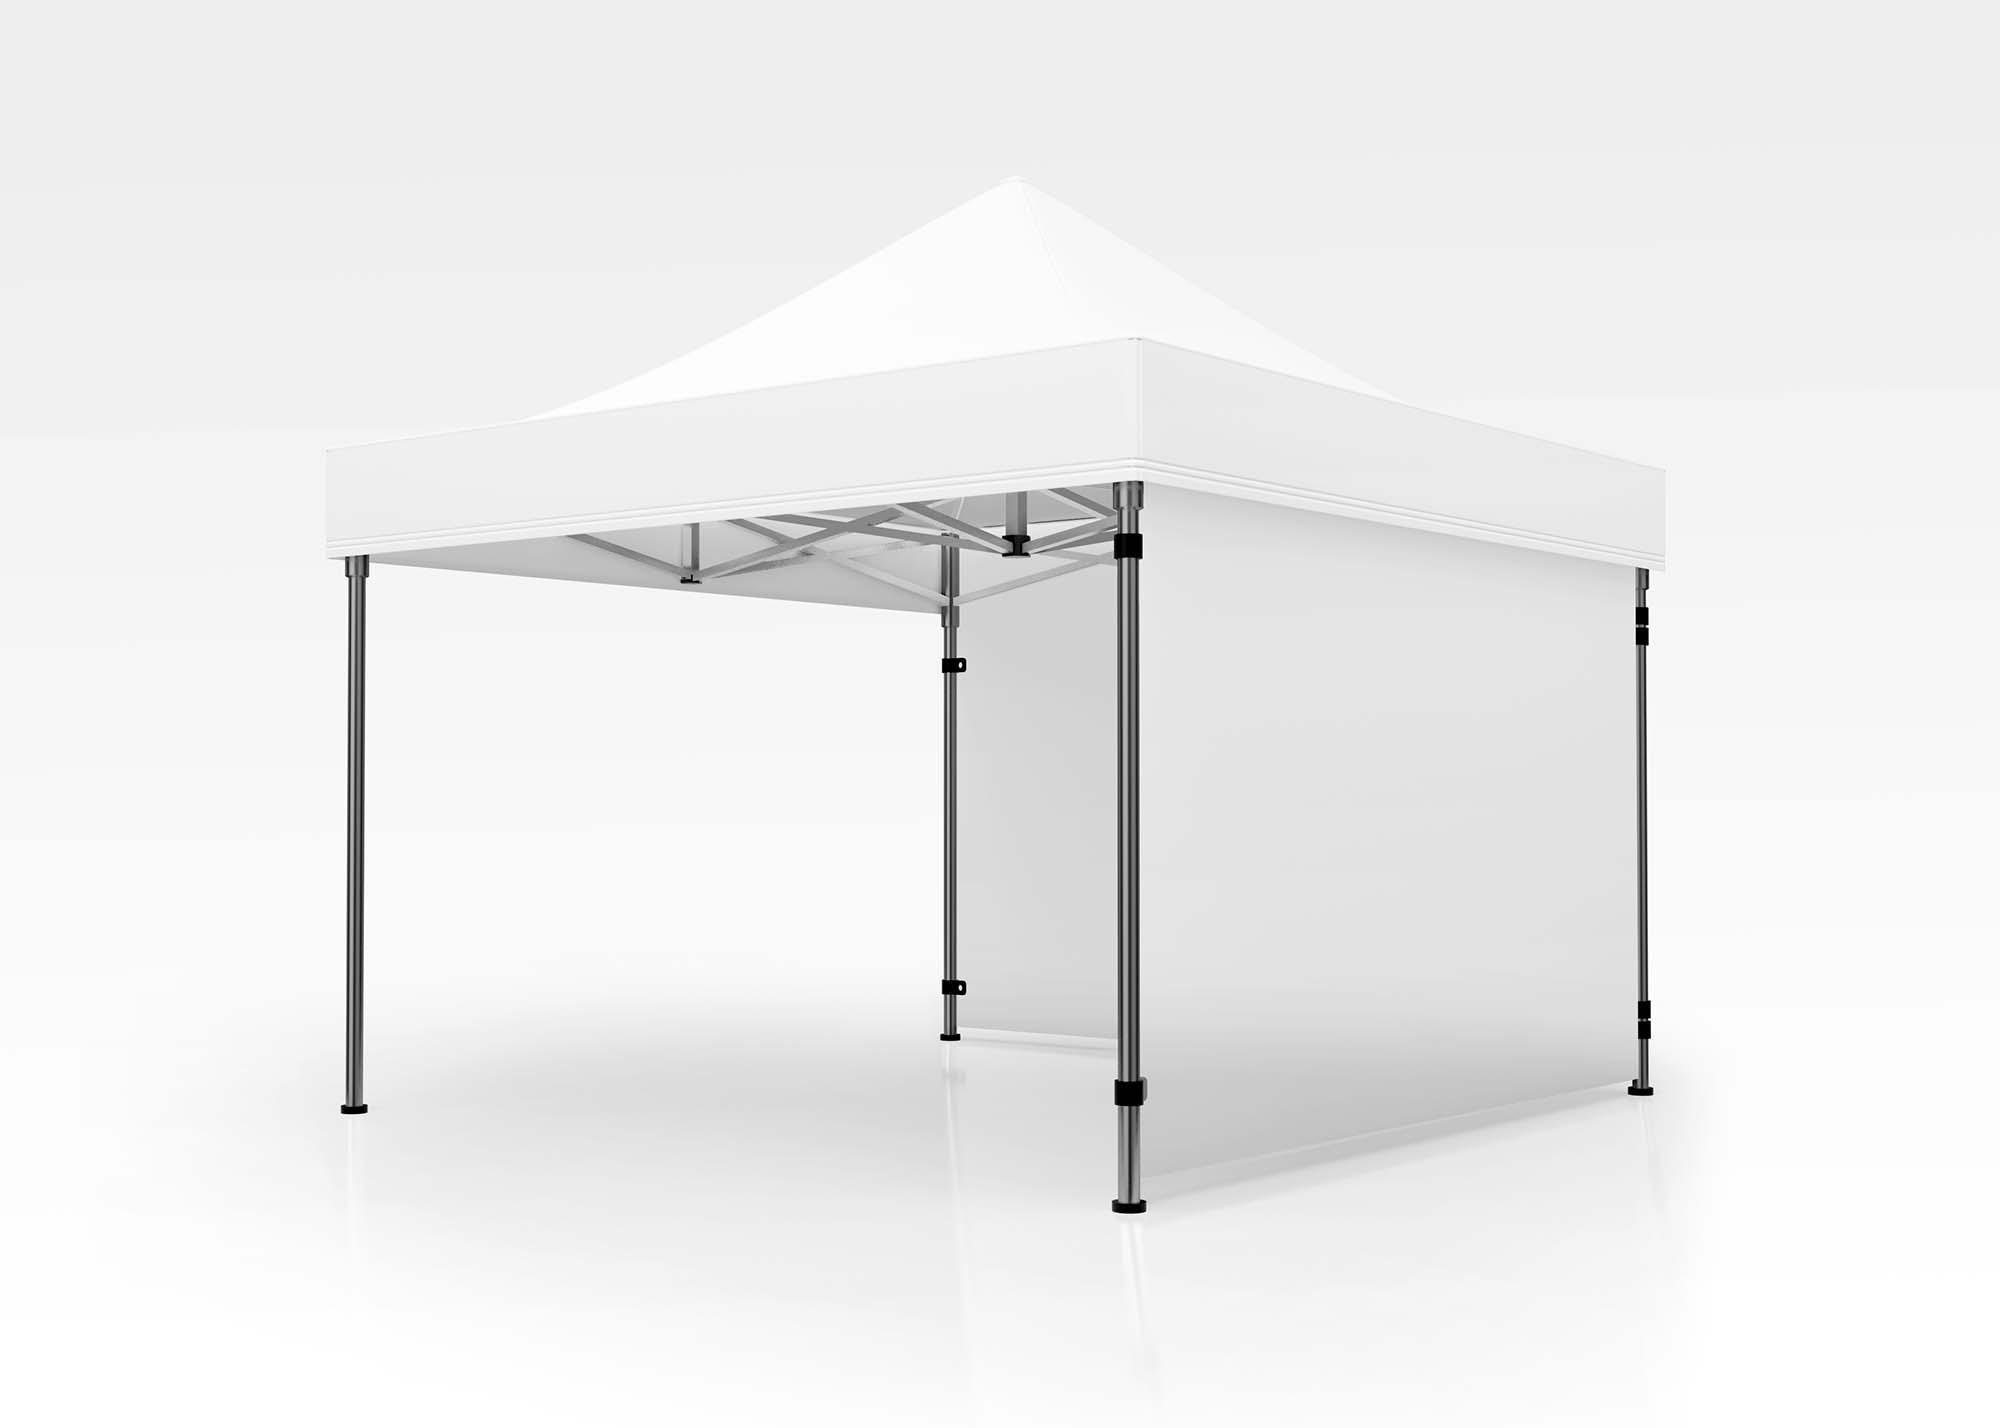 Display Tent Mockup 3